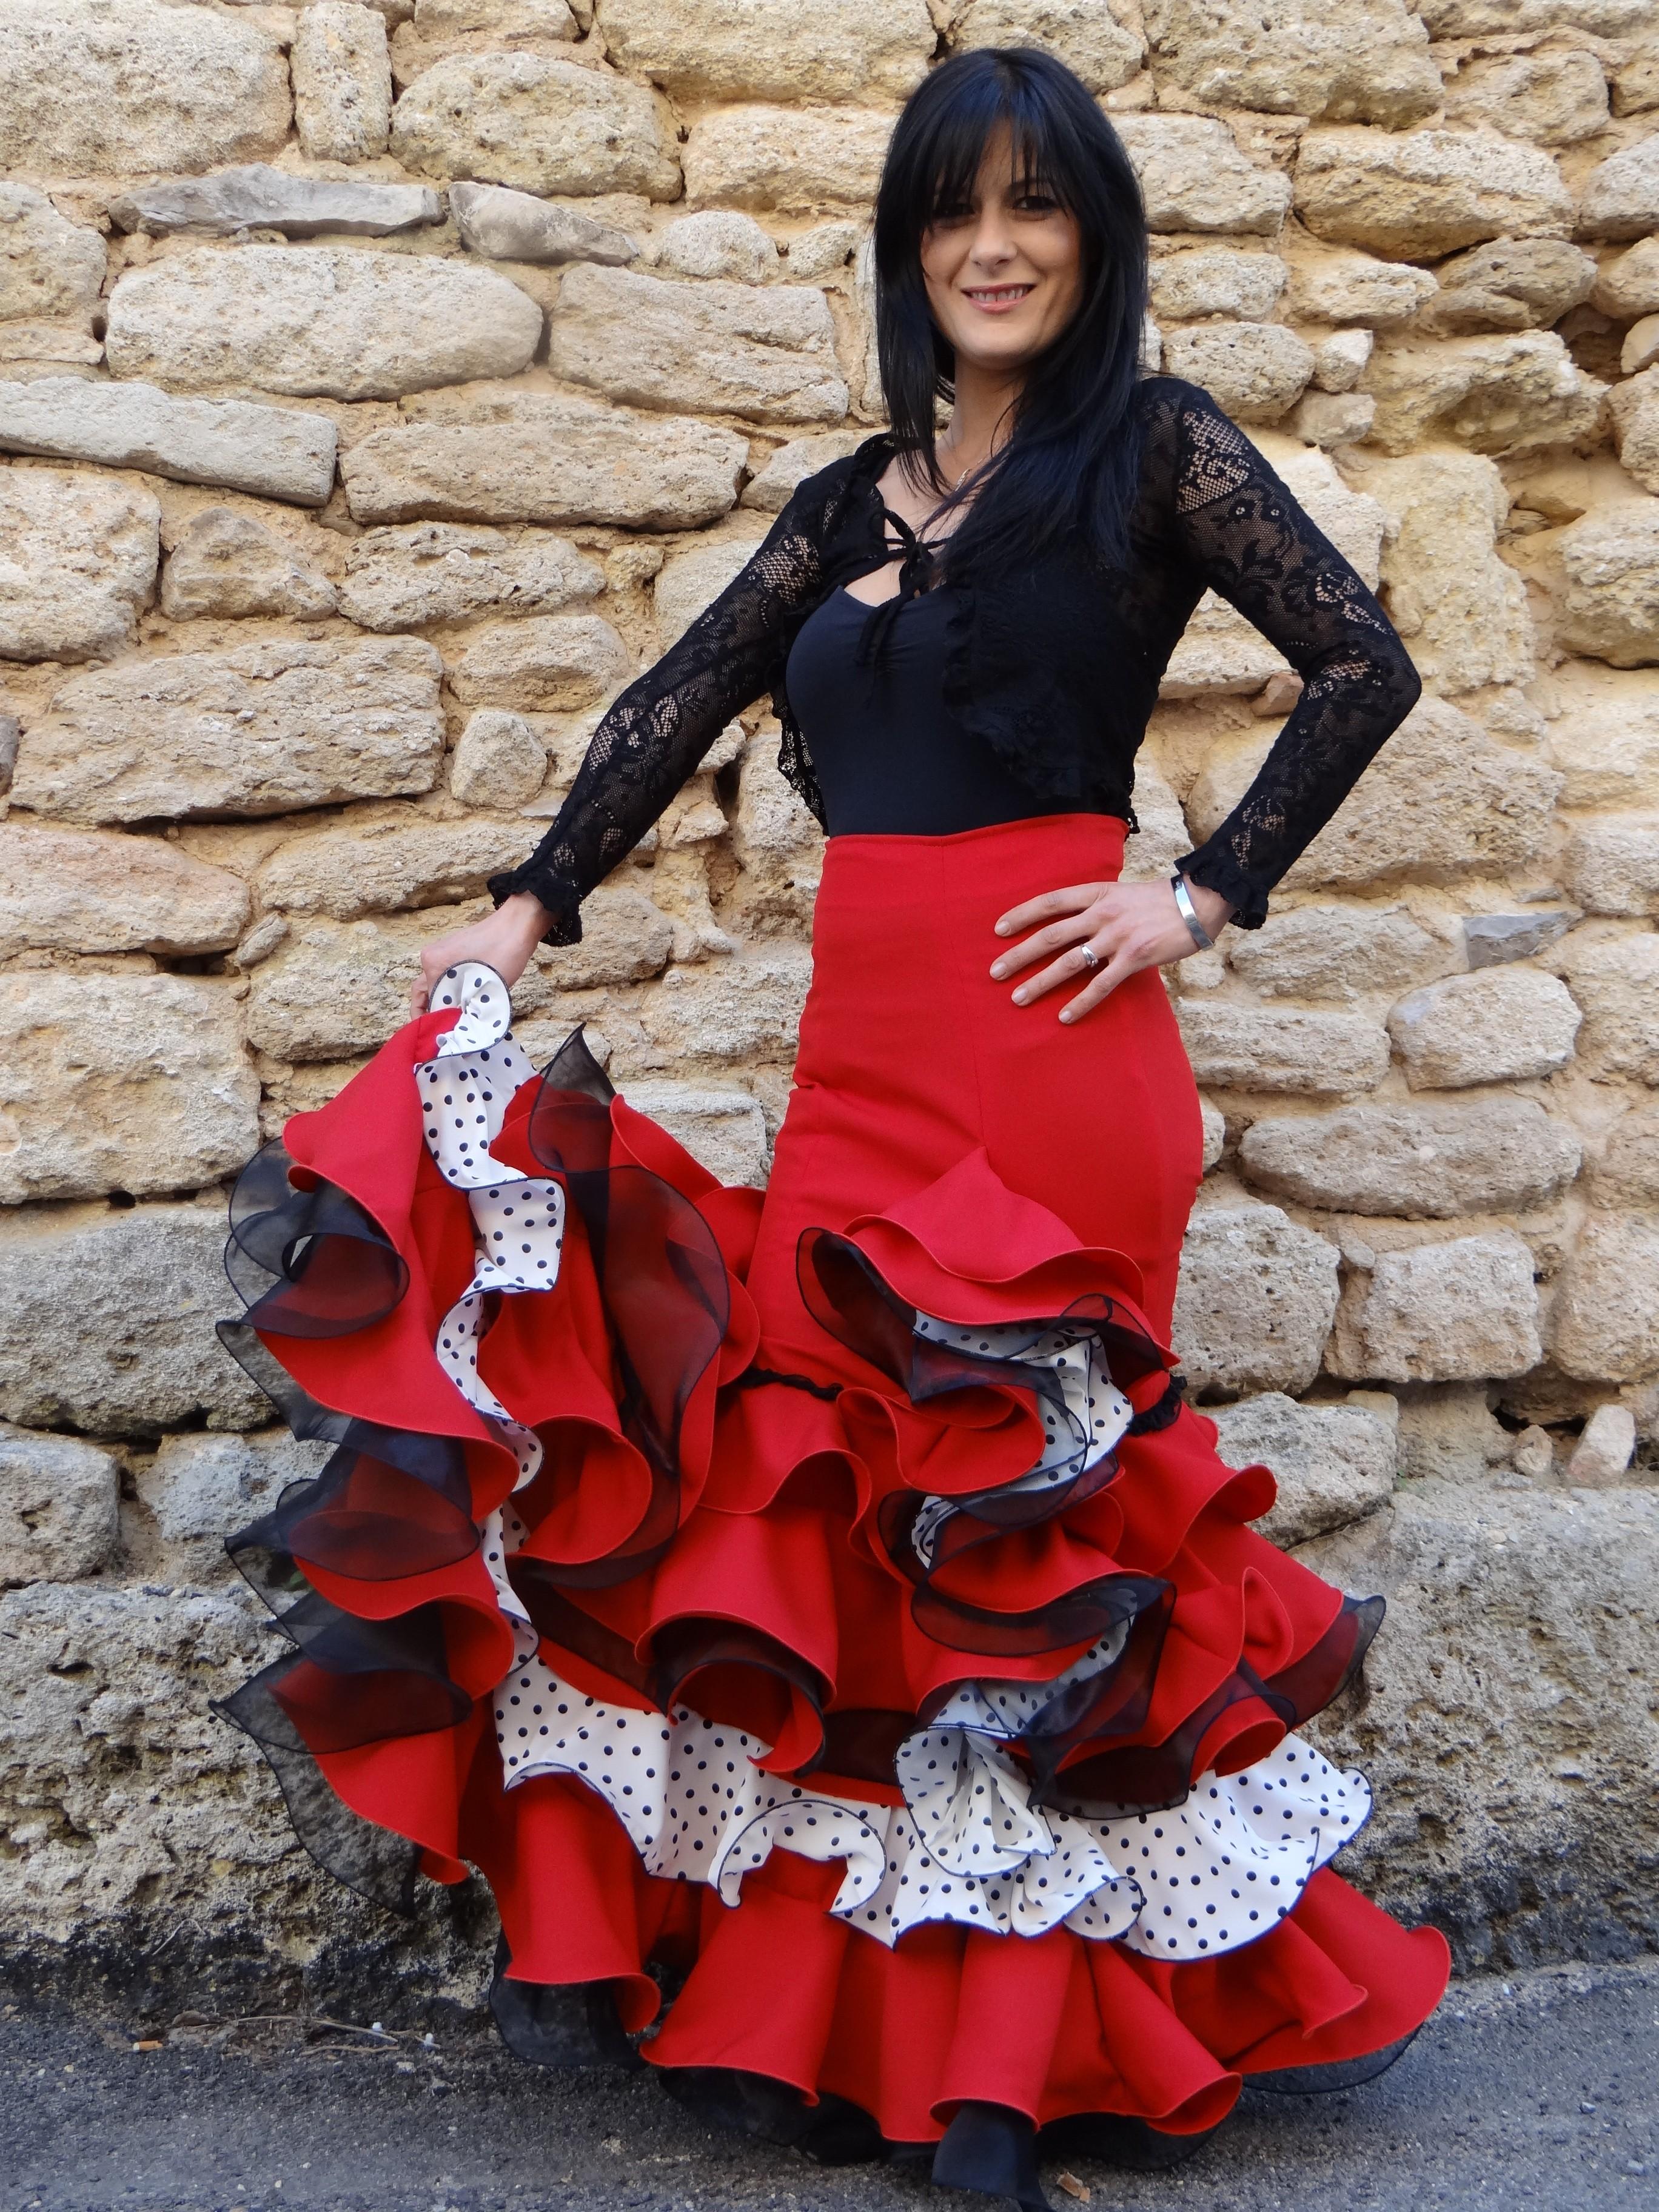 bdcd162588b06 Robe flamenco sevillane femme – Site de mode populaire